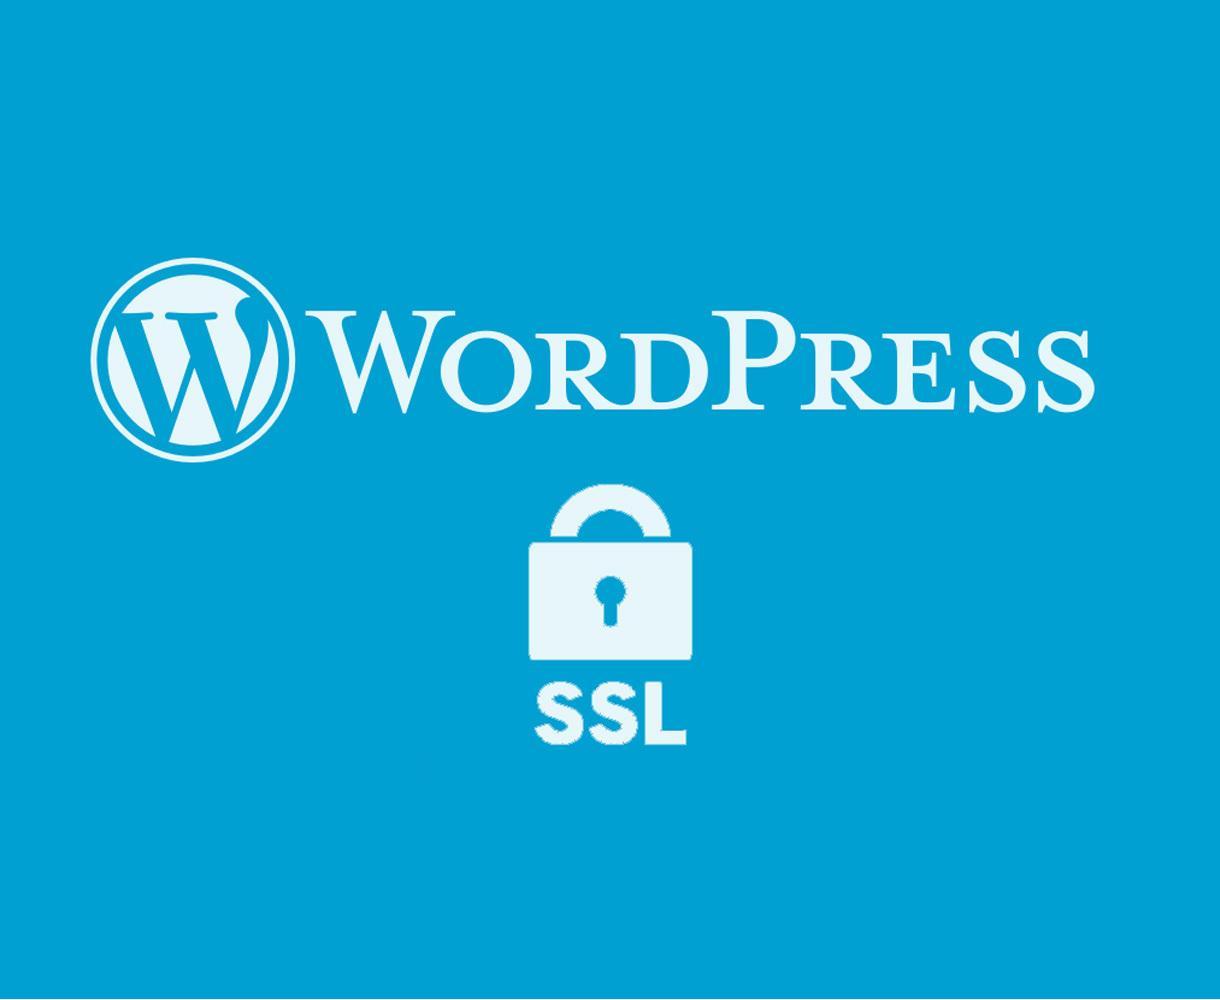 Wordpress完全SSL化[https]します 全部おまかせでお願いしたい人向け!SNSカウントも対応!